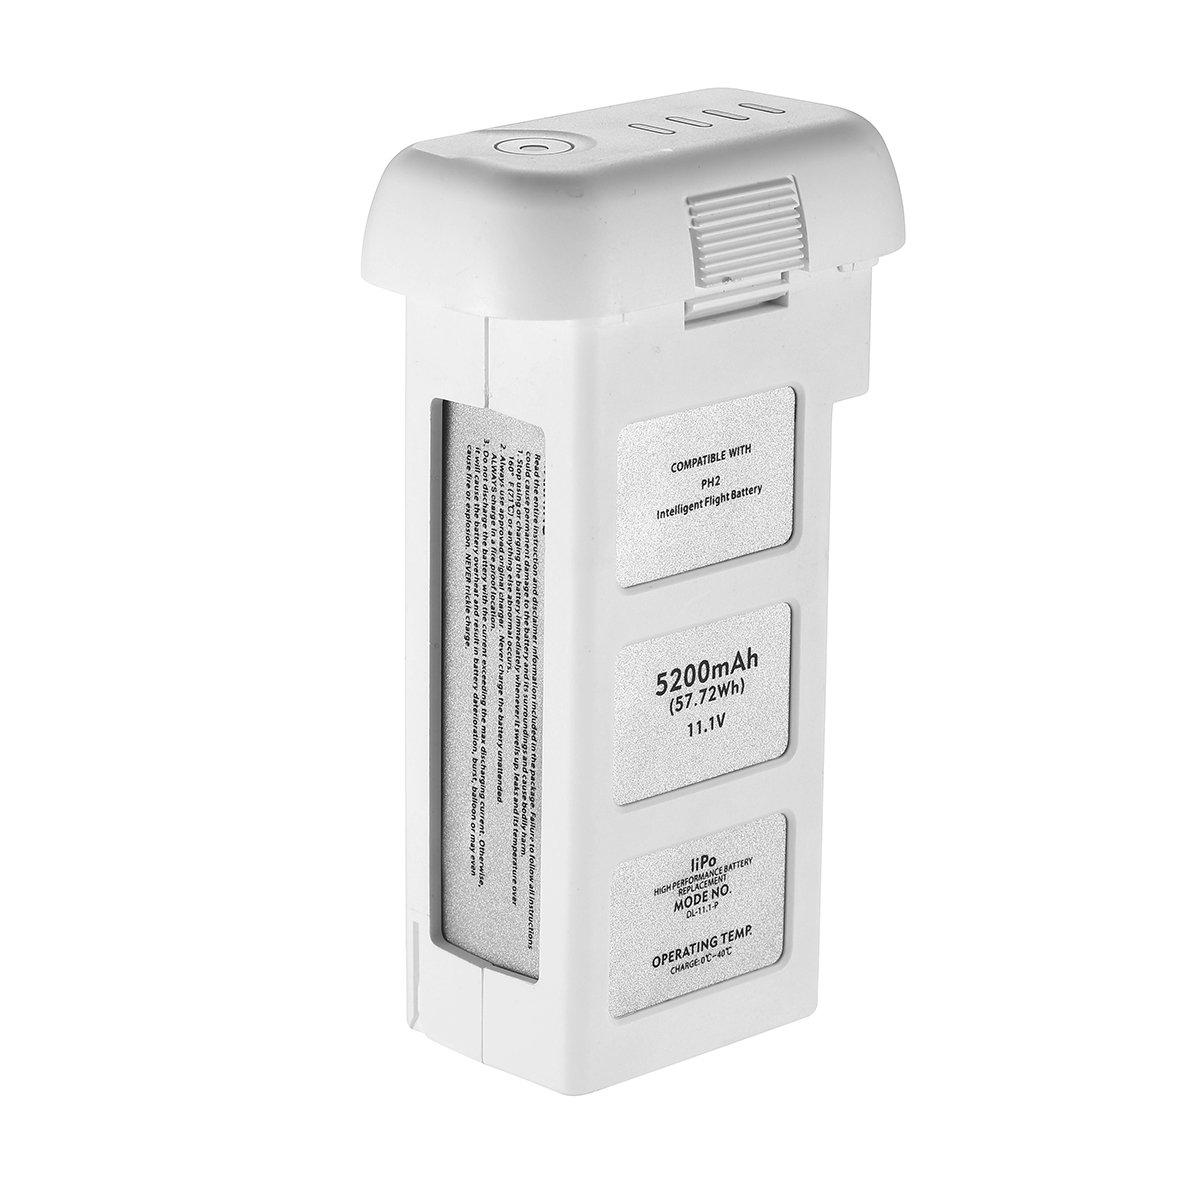 Powerextra 11.1V 5200mAh 10C LiPo Intelligent Flight Battery Replacement for DJI Phantom 2, Phantom 2 Vision and Phantom 2 Vision Plus - Upgraded